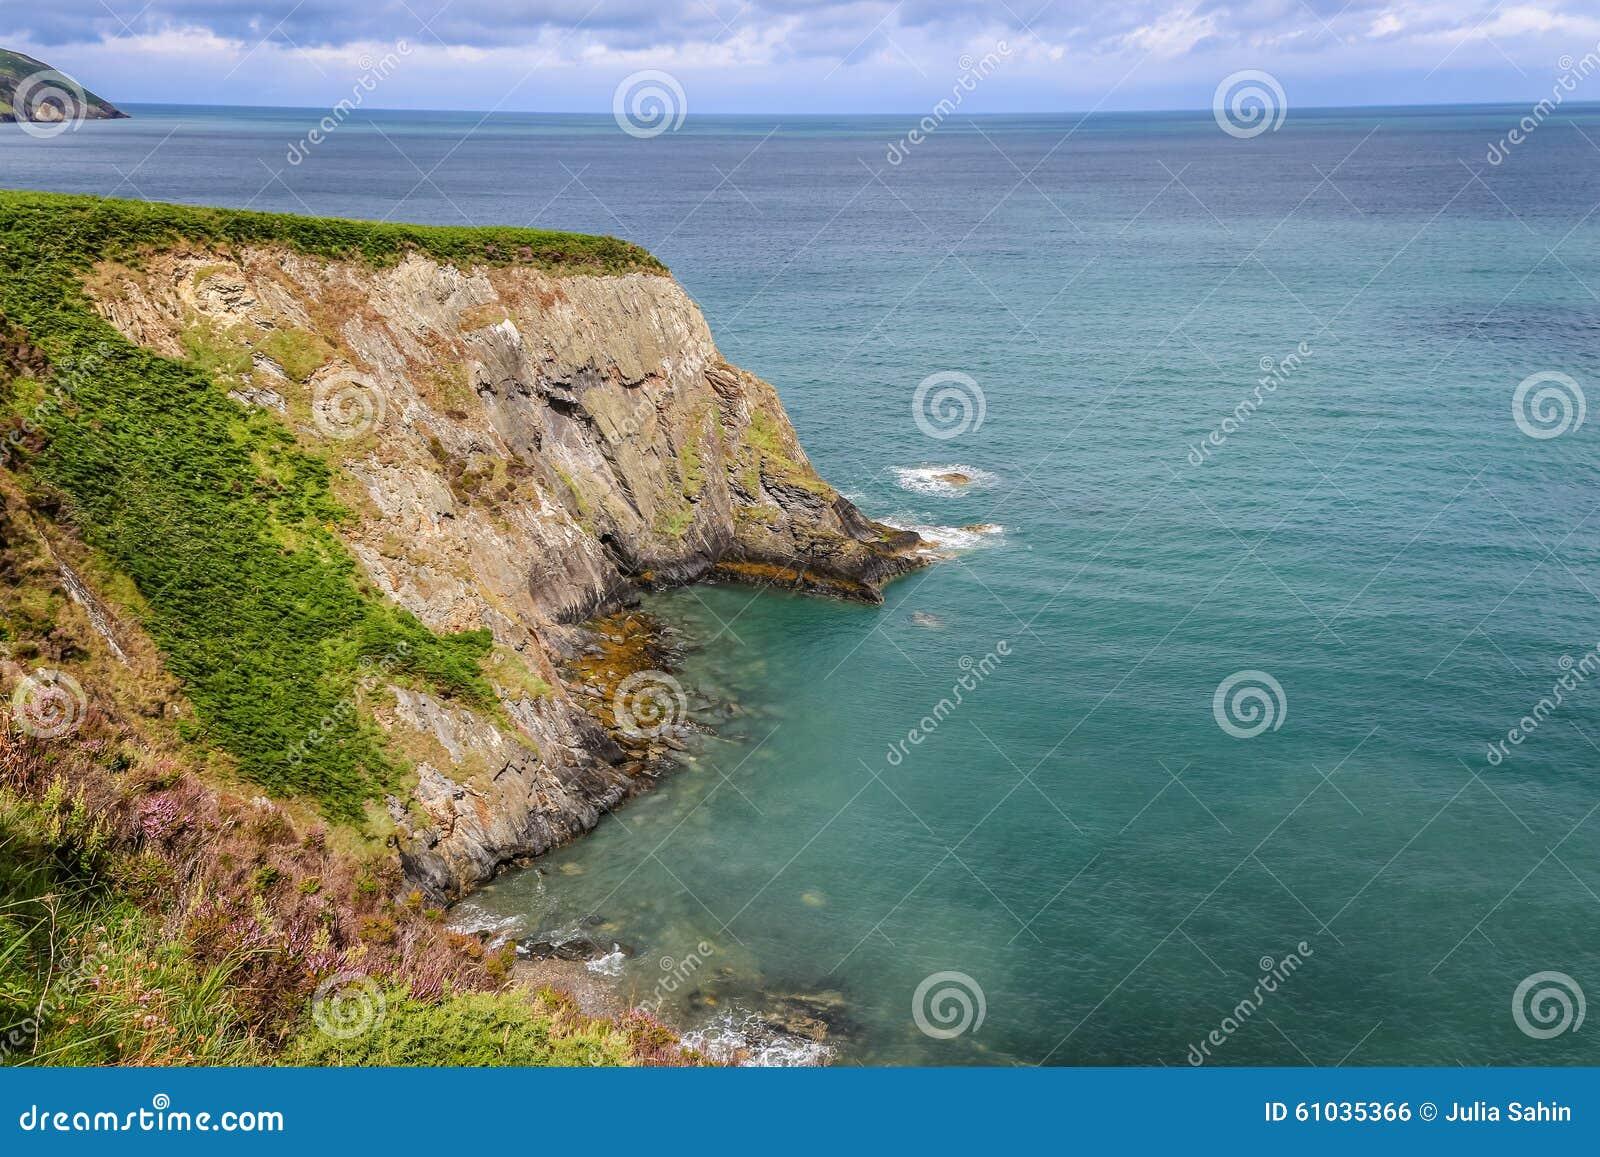 Cliffs and coastline.